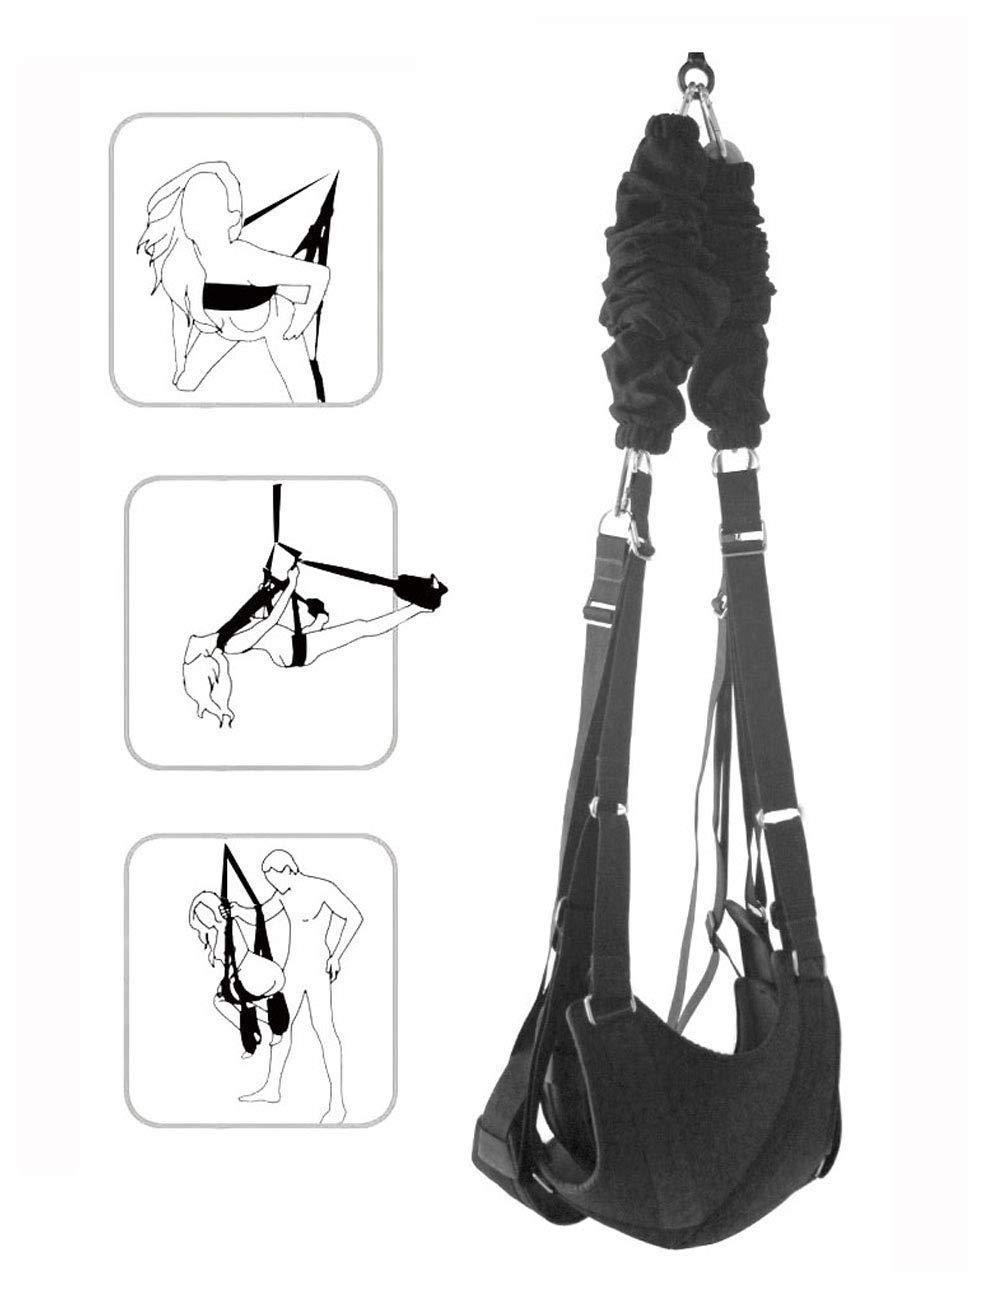 Uudireo Pleasure Toy Swing Door Kit, Door Hanging Swing for Comfortable Support with Strong Nylon, Adjustable Durability and Comfort for Couple Play Women by Uudireo